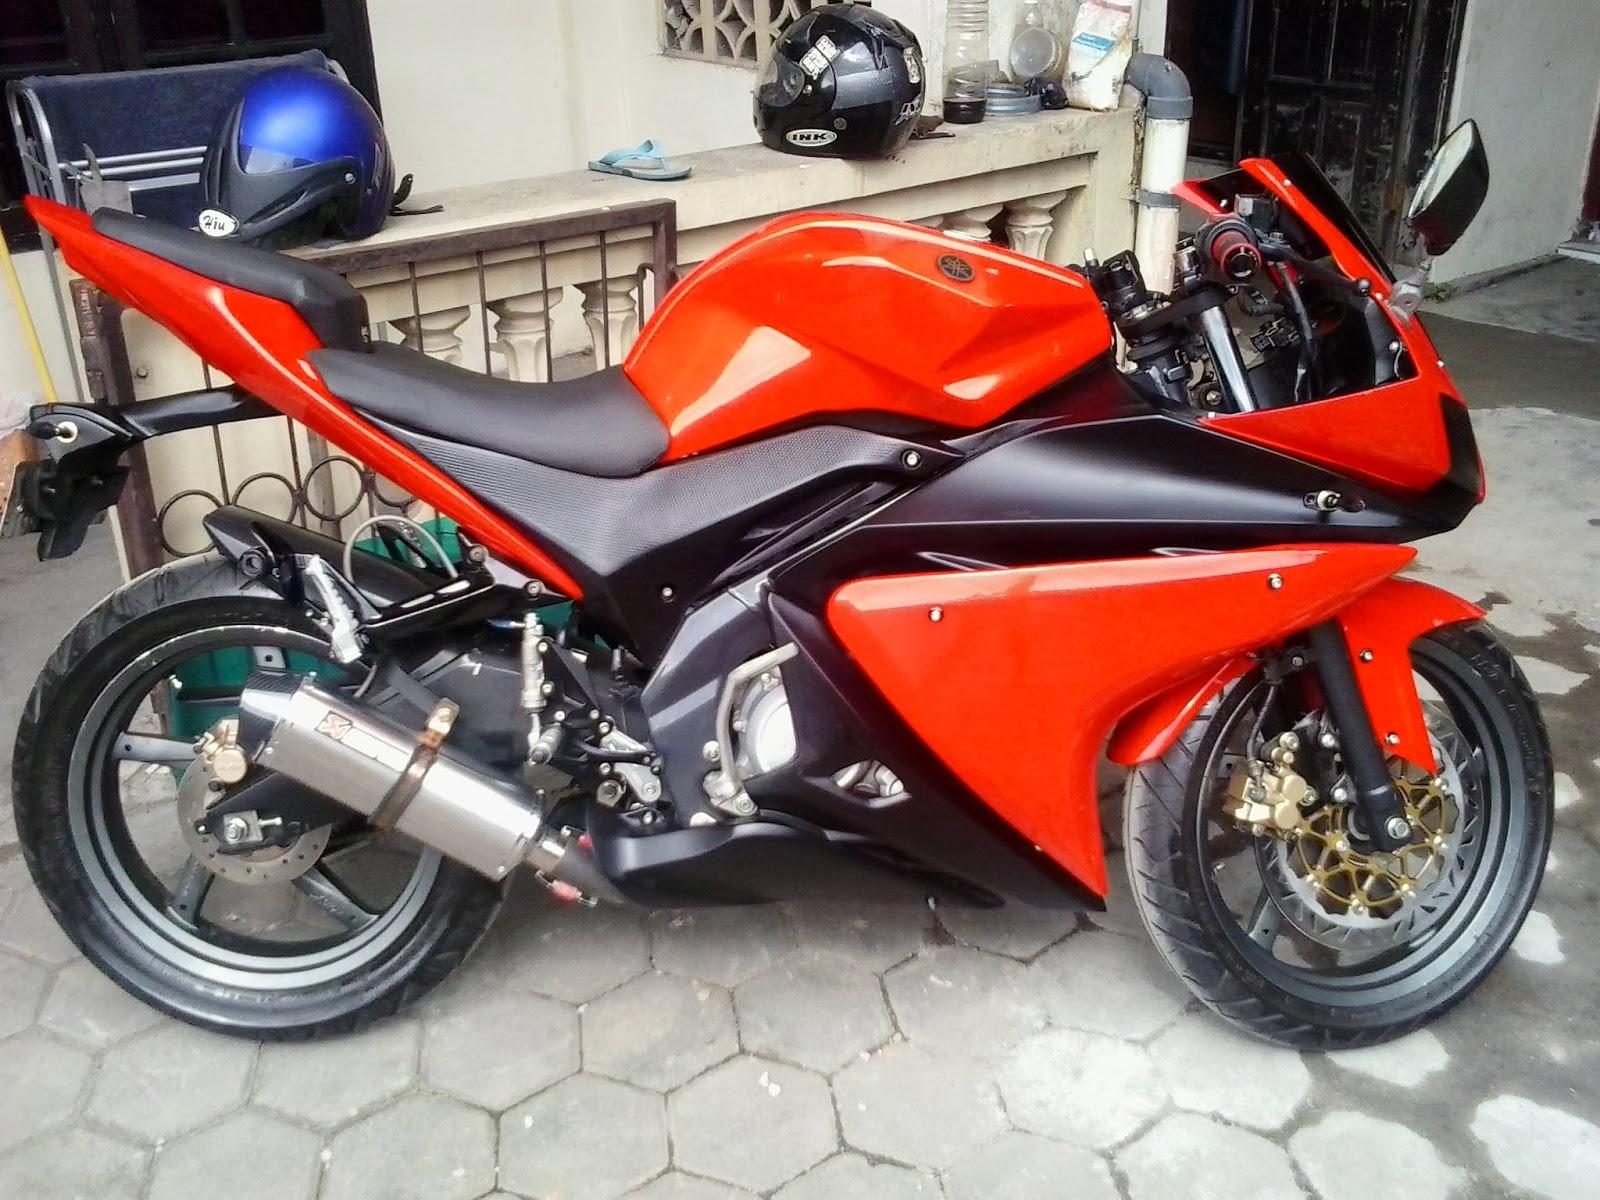 Modif Yamaha Vixion Hitam